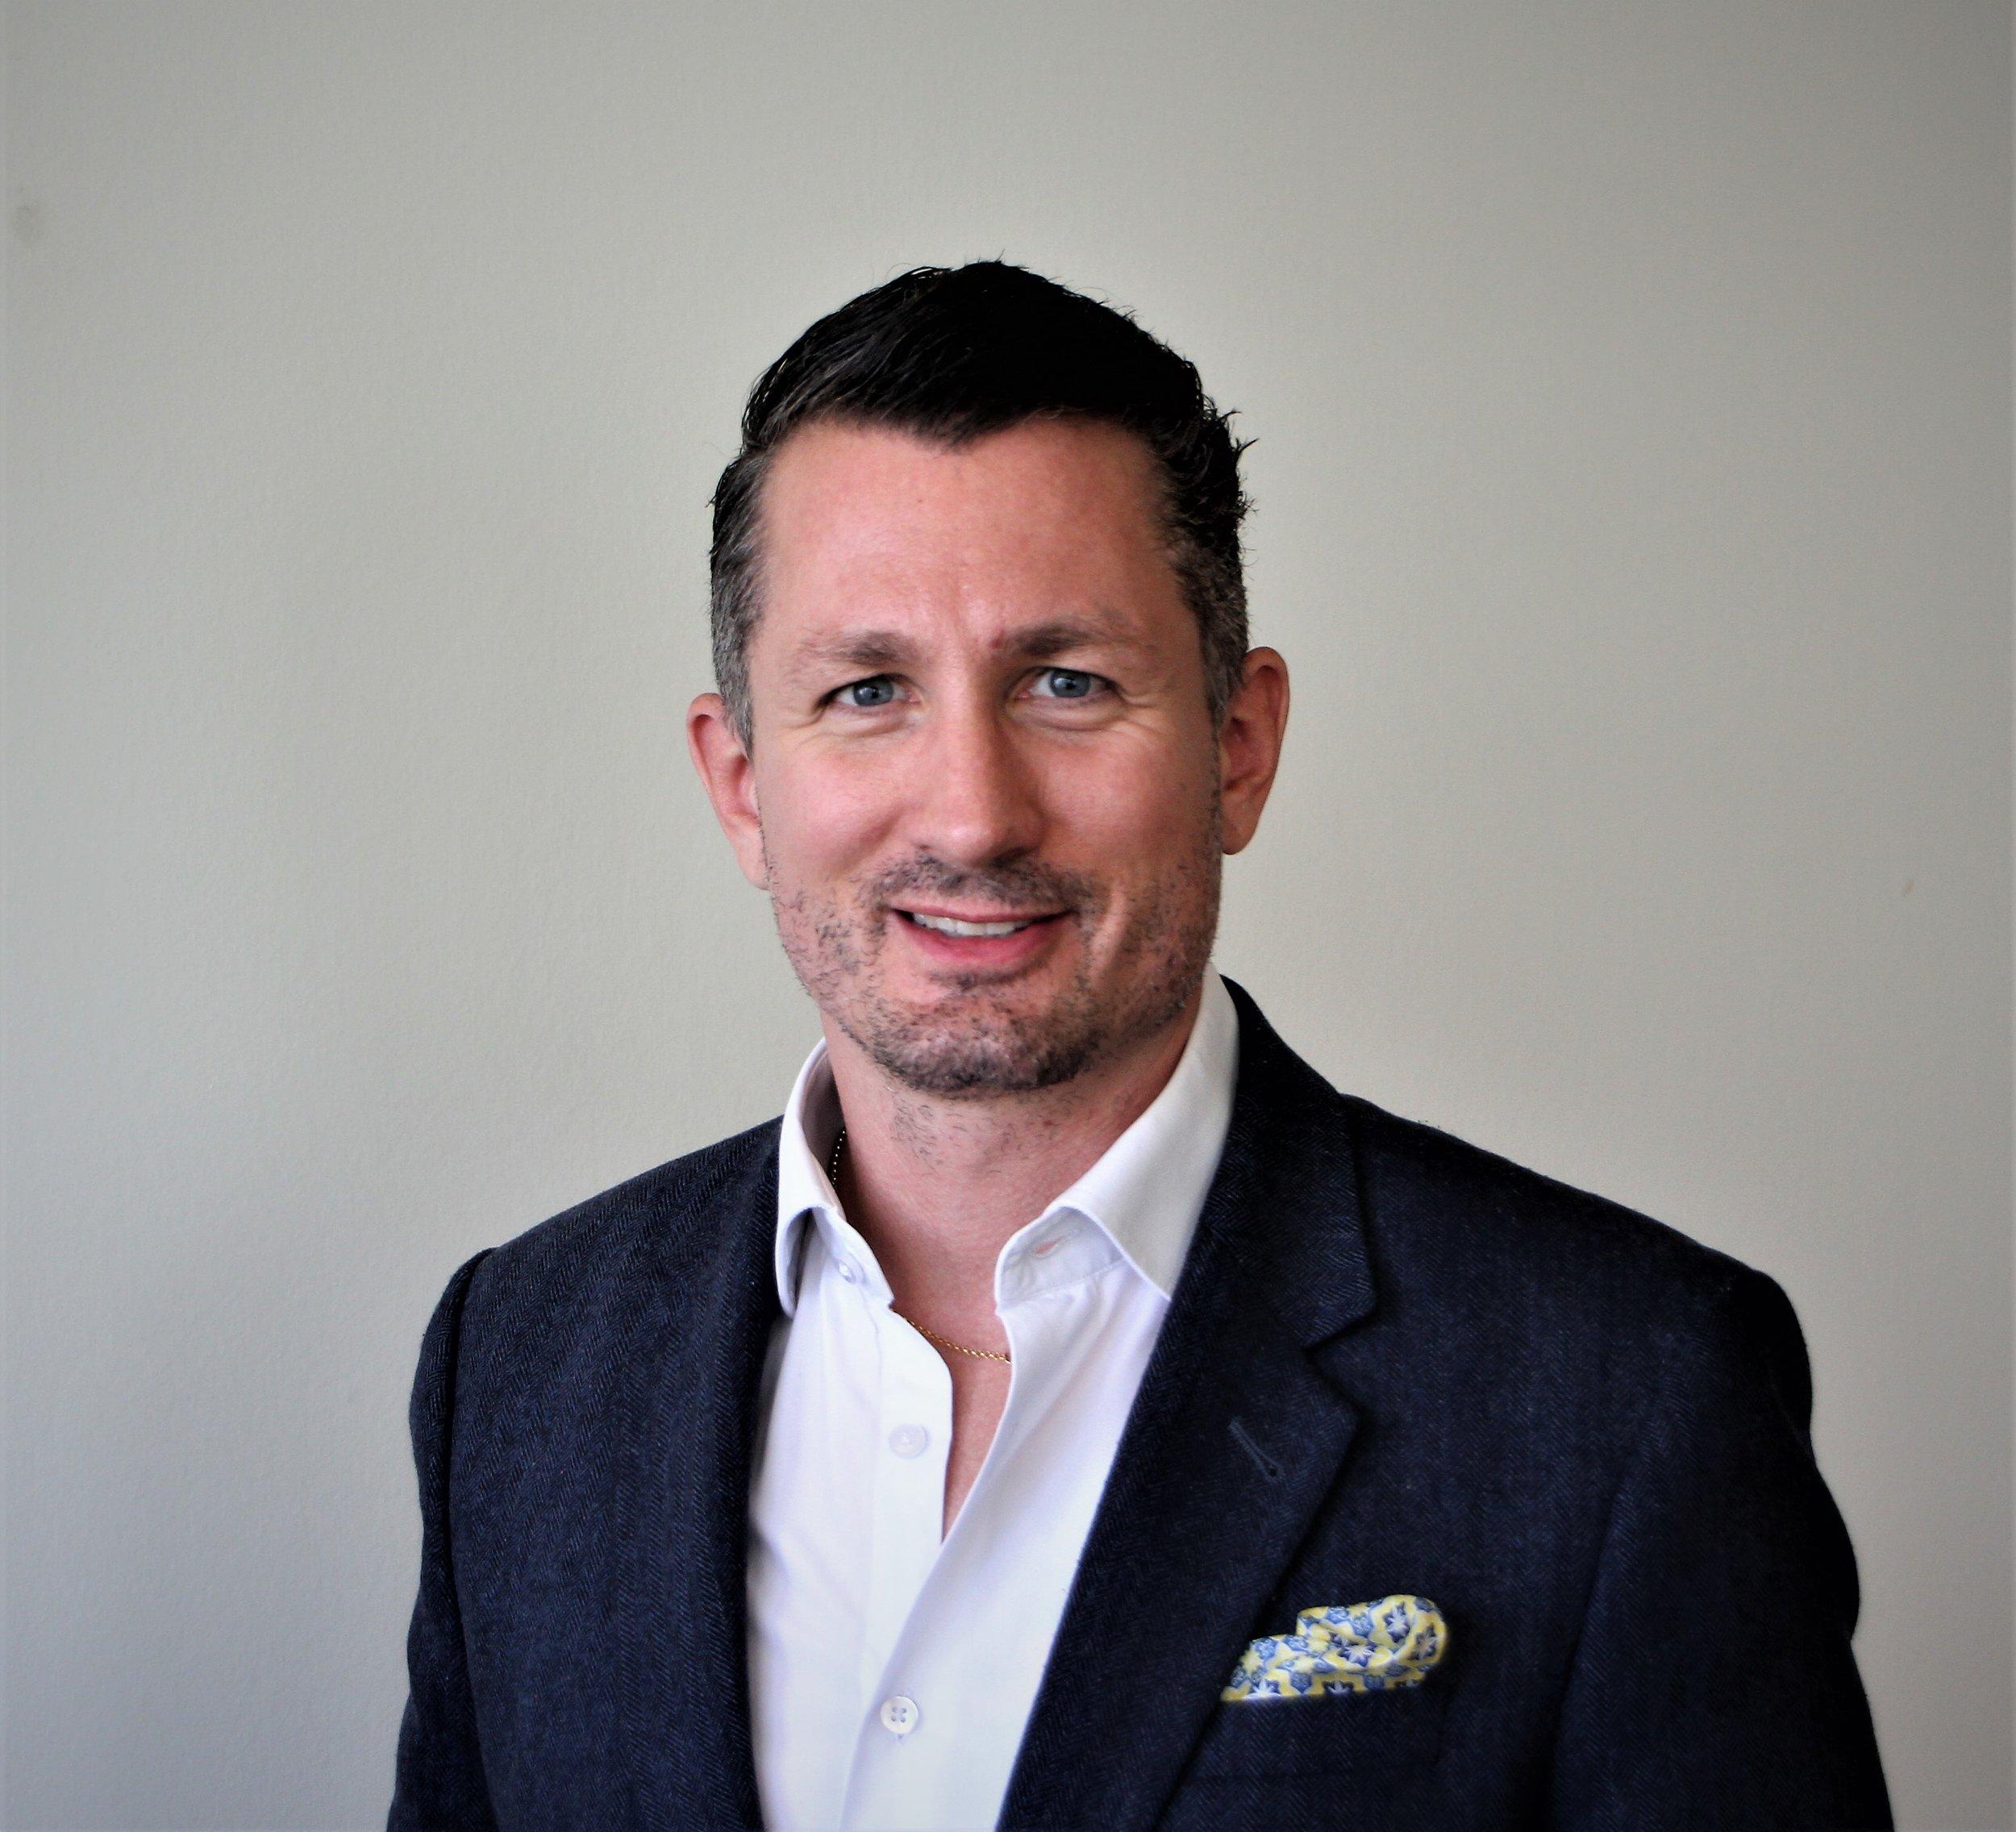 Daniel Biesuz - Blockchain & Fintech Consultant